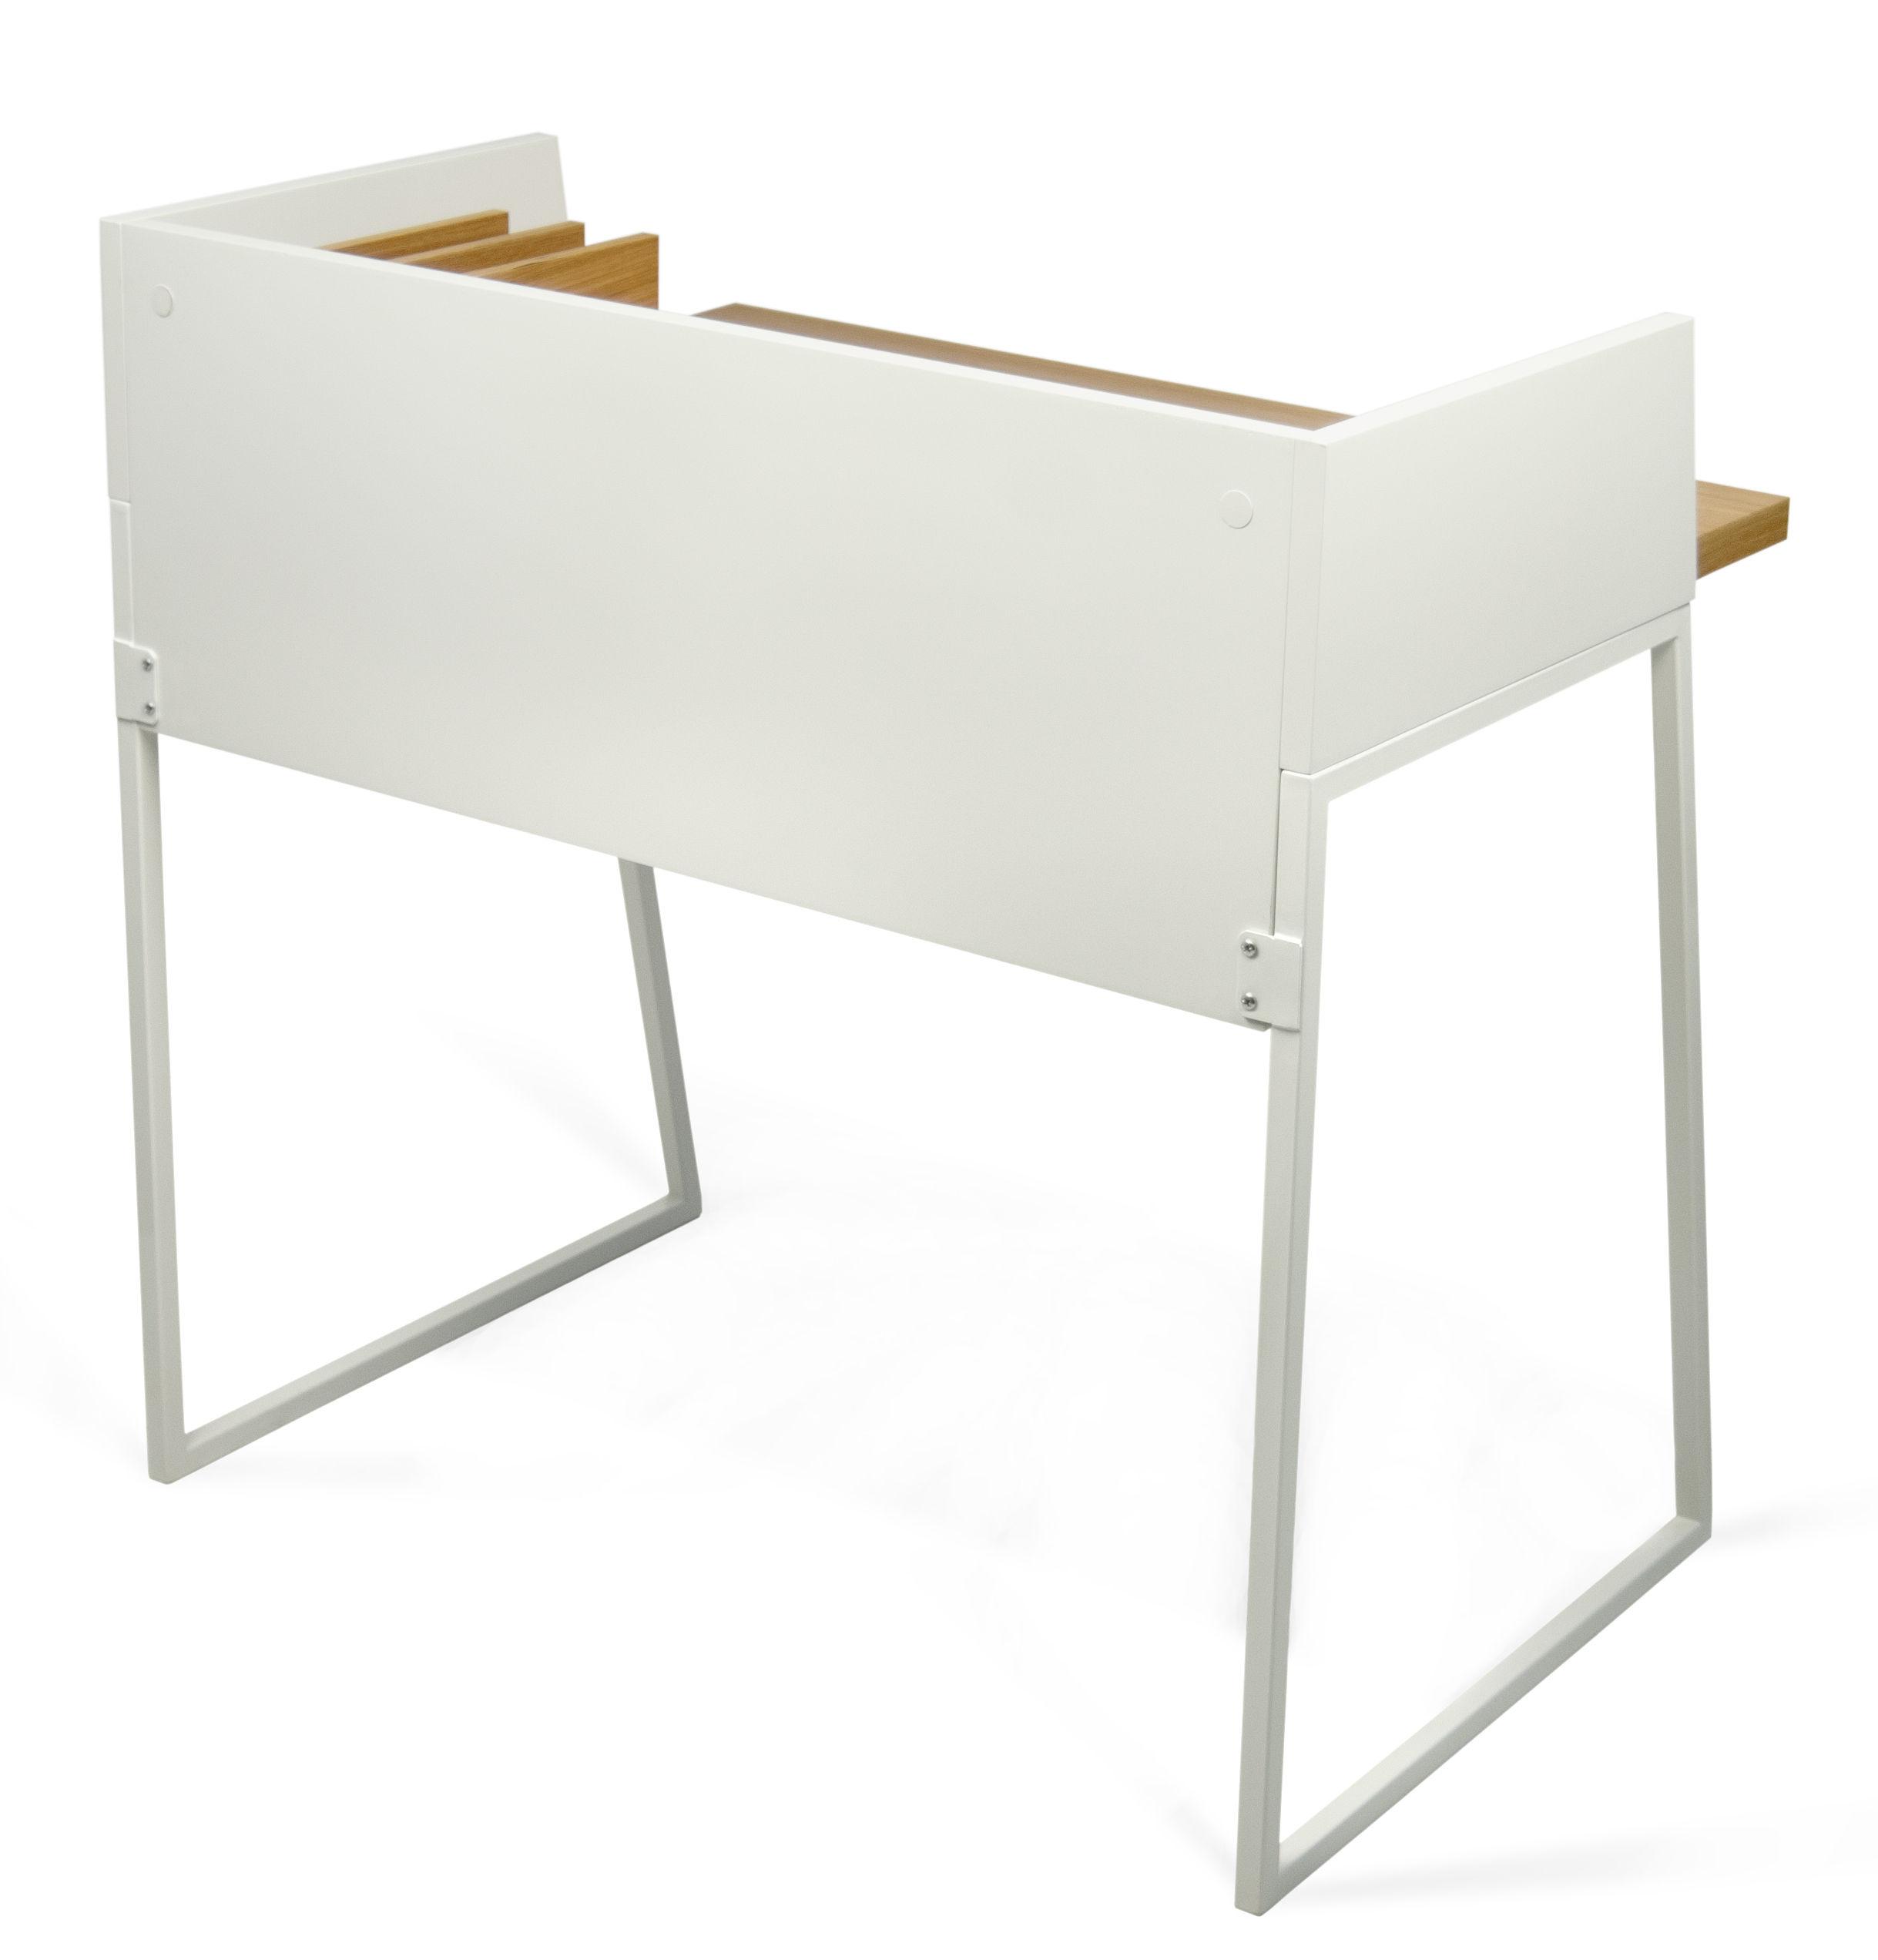 bureau working pop up home blanc ch ne l 90 x h 88 made in design. Black Bedroom Furniture Sets. Home Design Ideas